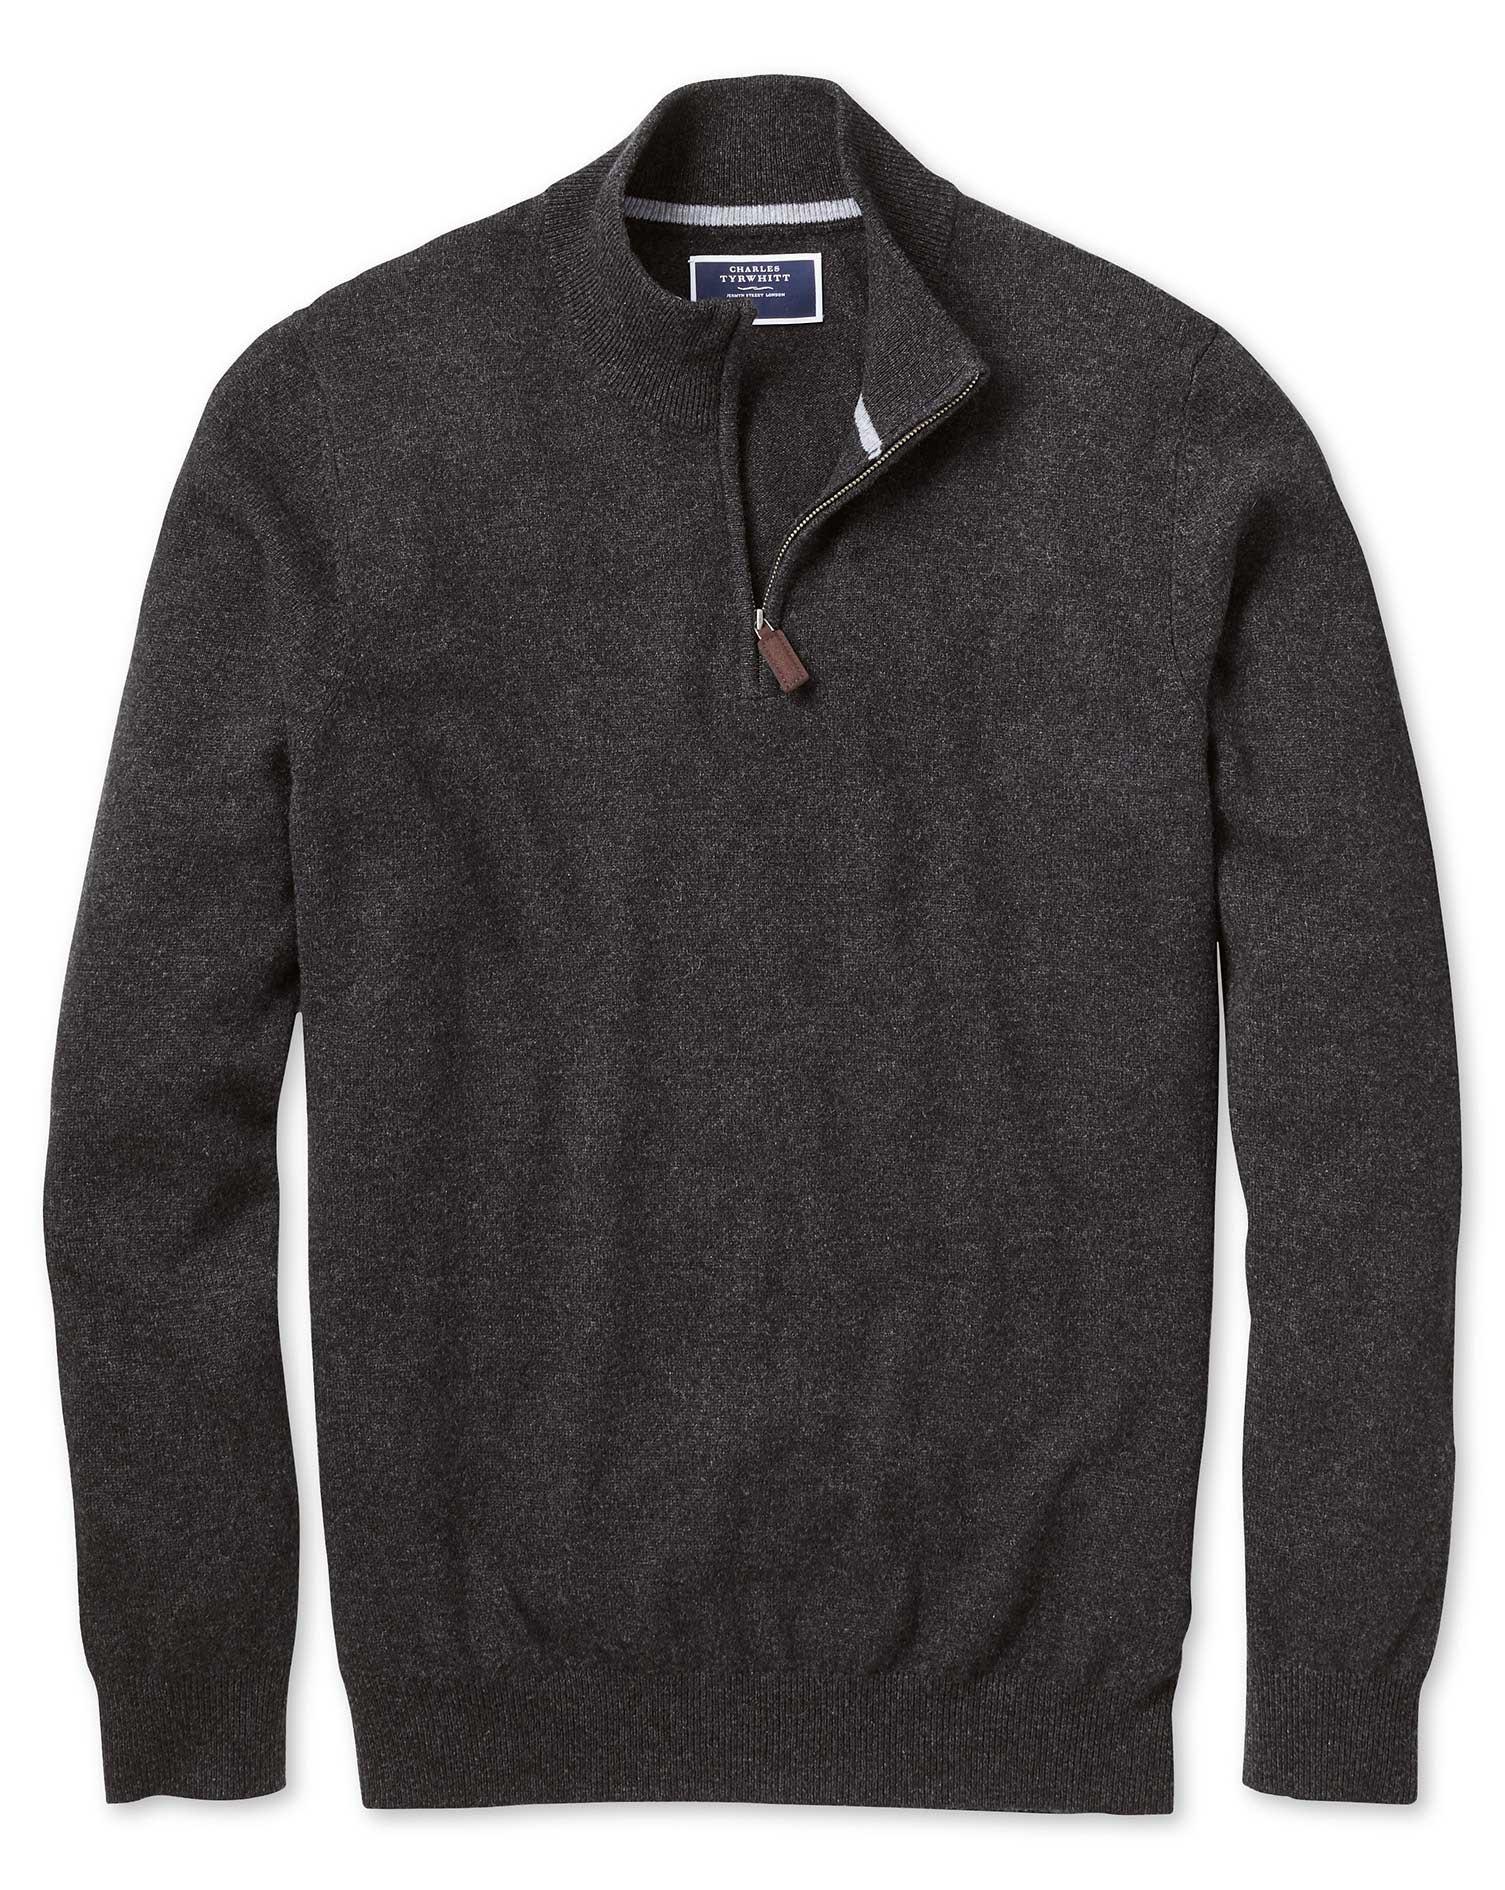 Charcoal Zip Neck Cashmere Jumper Size XXXL by Charles Tyrwhitt